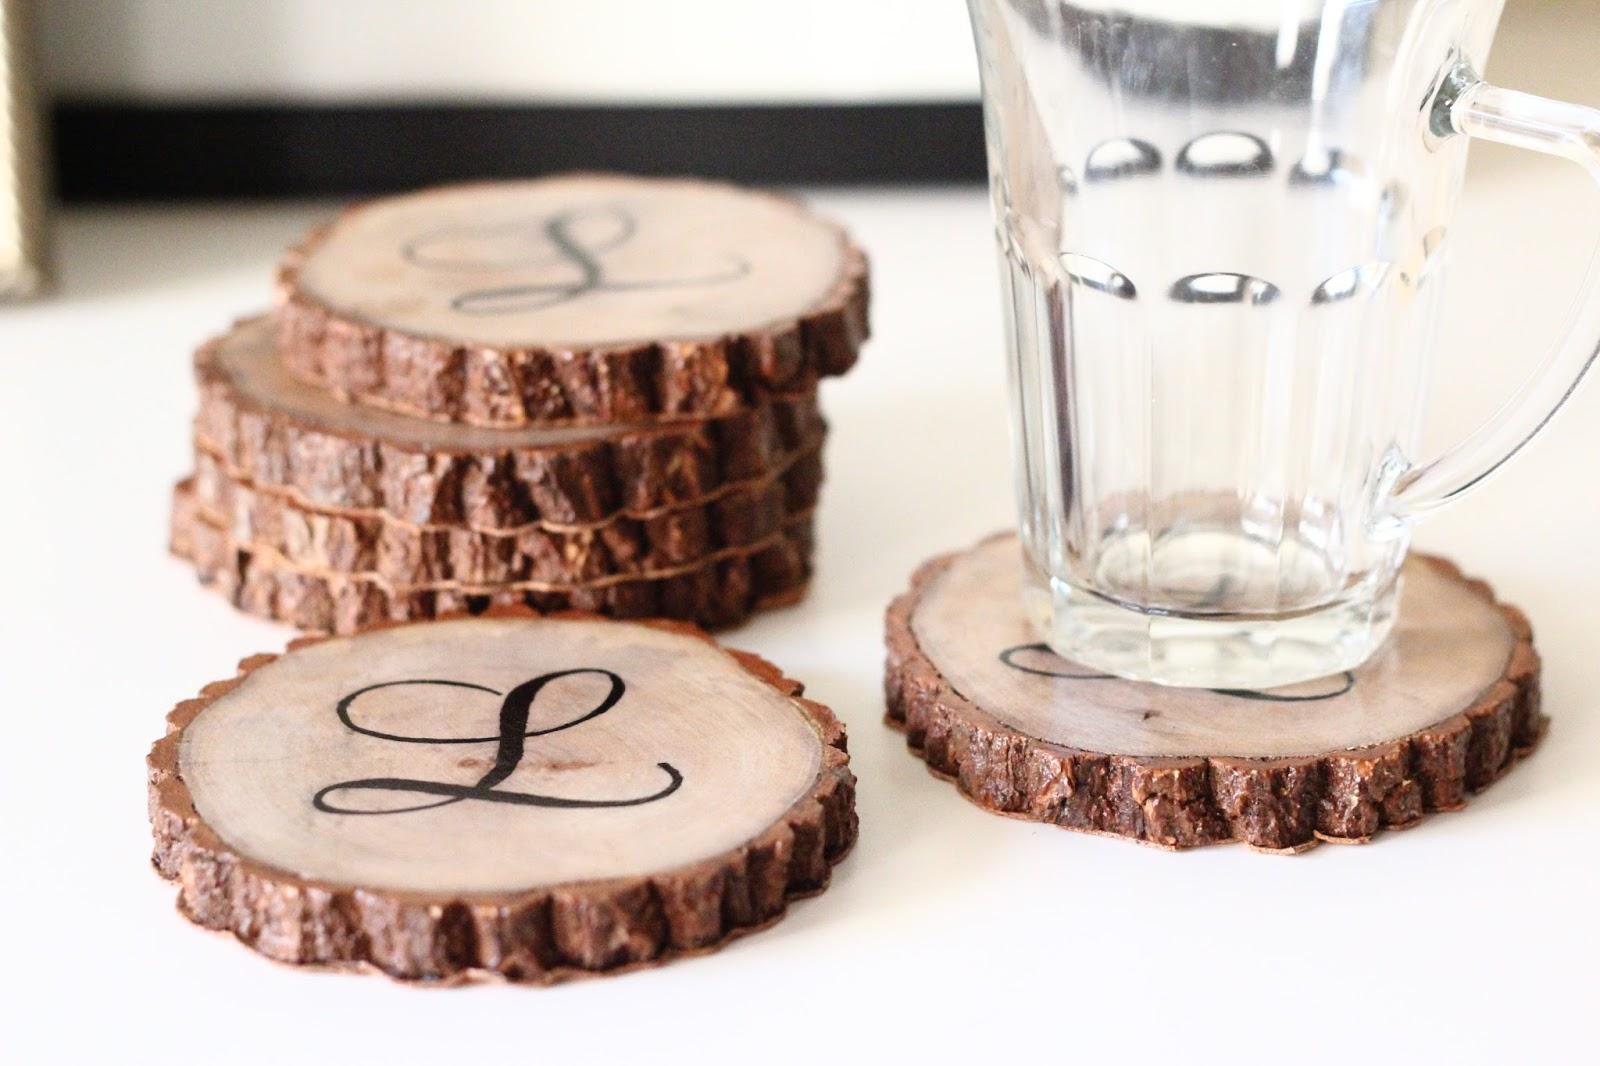 DoLeeNotedDIY TutorialWood Branch Slice Monogrammed Coasters